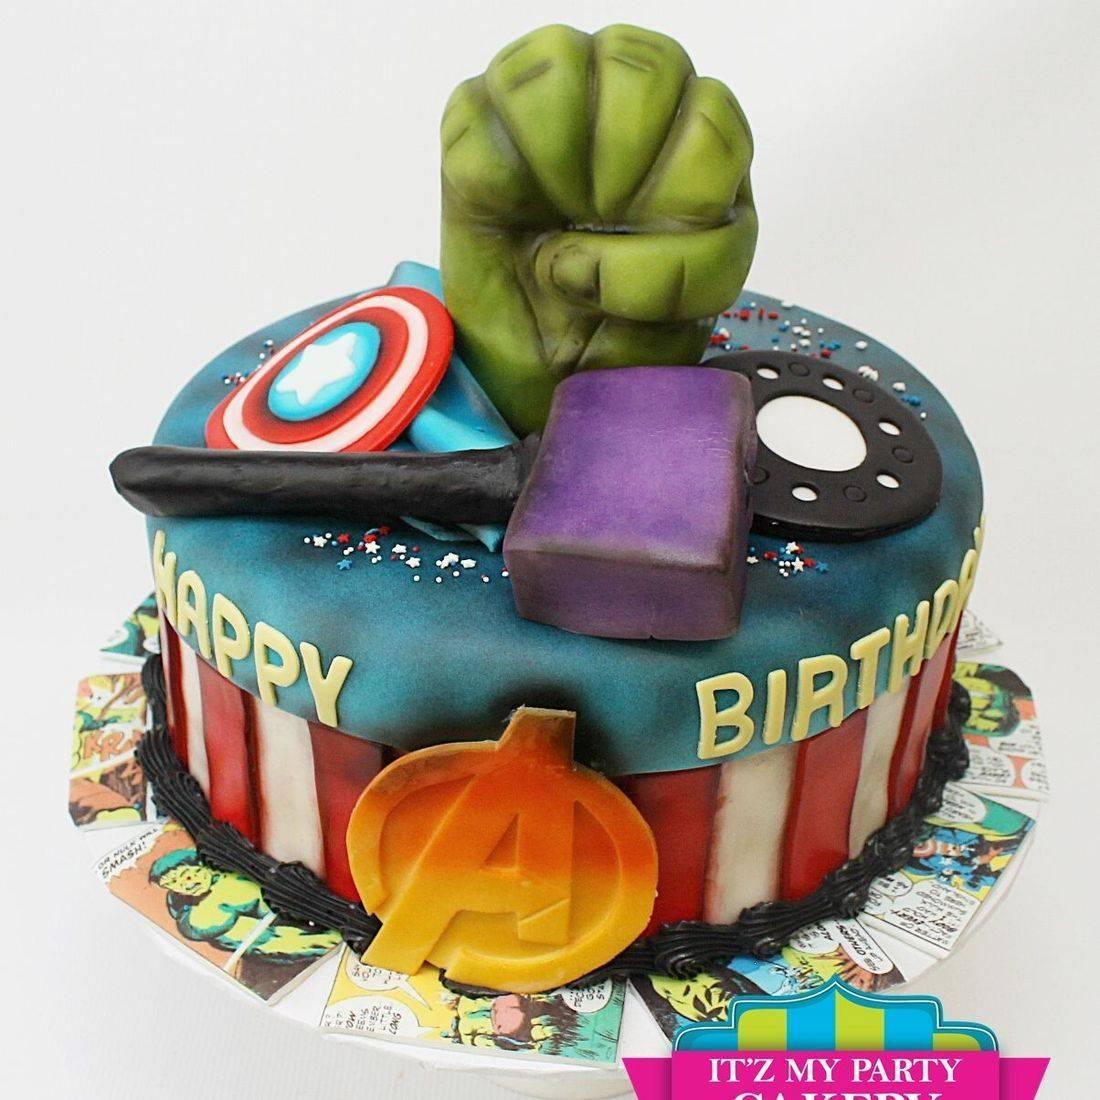 Super hero avengers captain america thor hulk iron man cake milwaukee